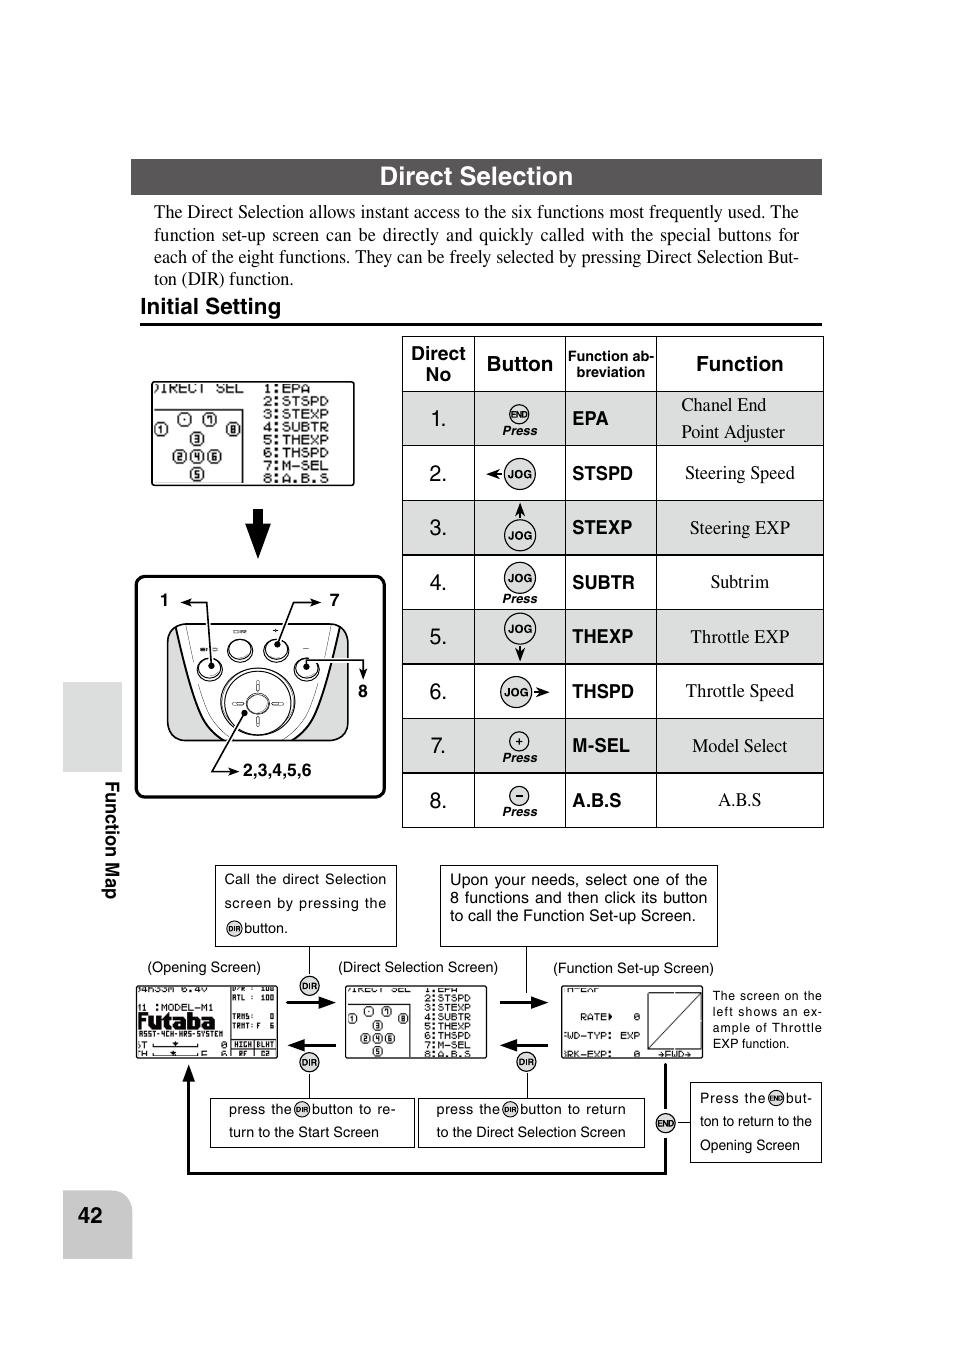 direct selection initial setting futaba 4pk 2 4ghz user manual rh manualsdir com Instruction Manual Example User Manual PDF